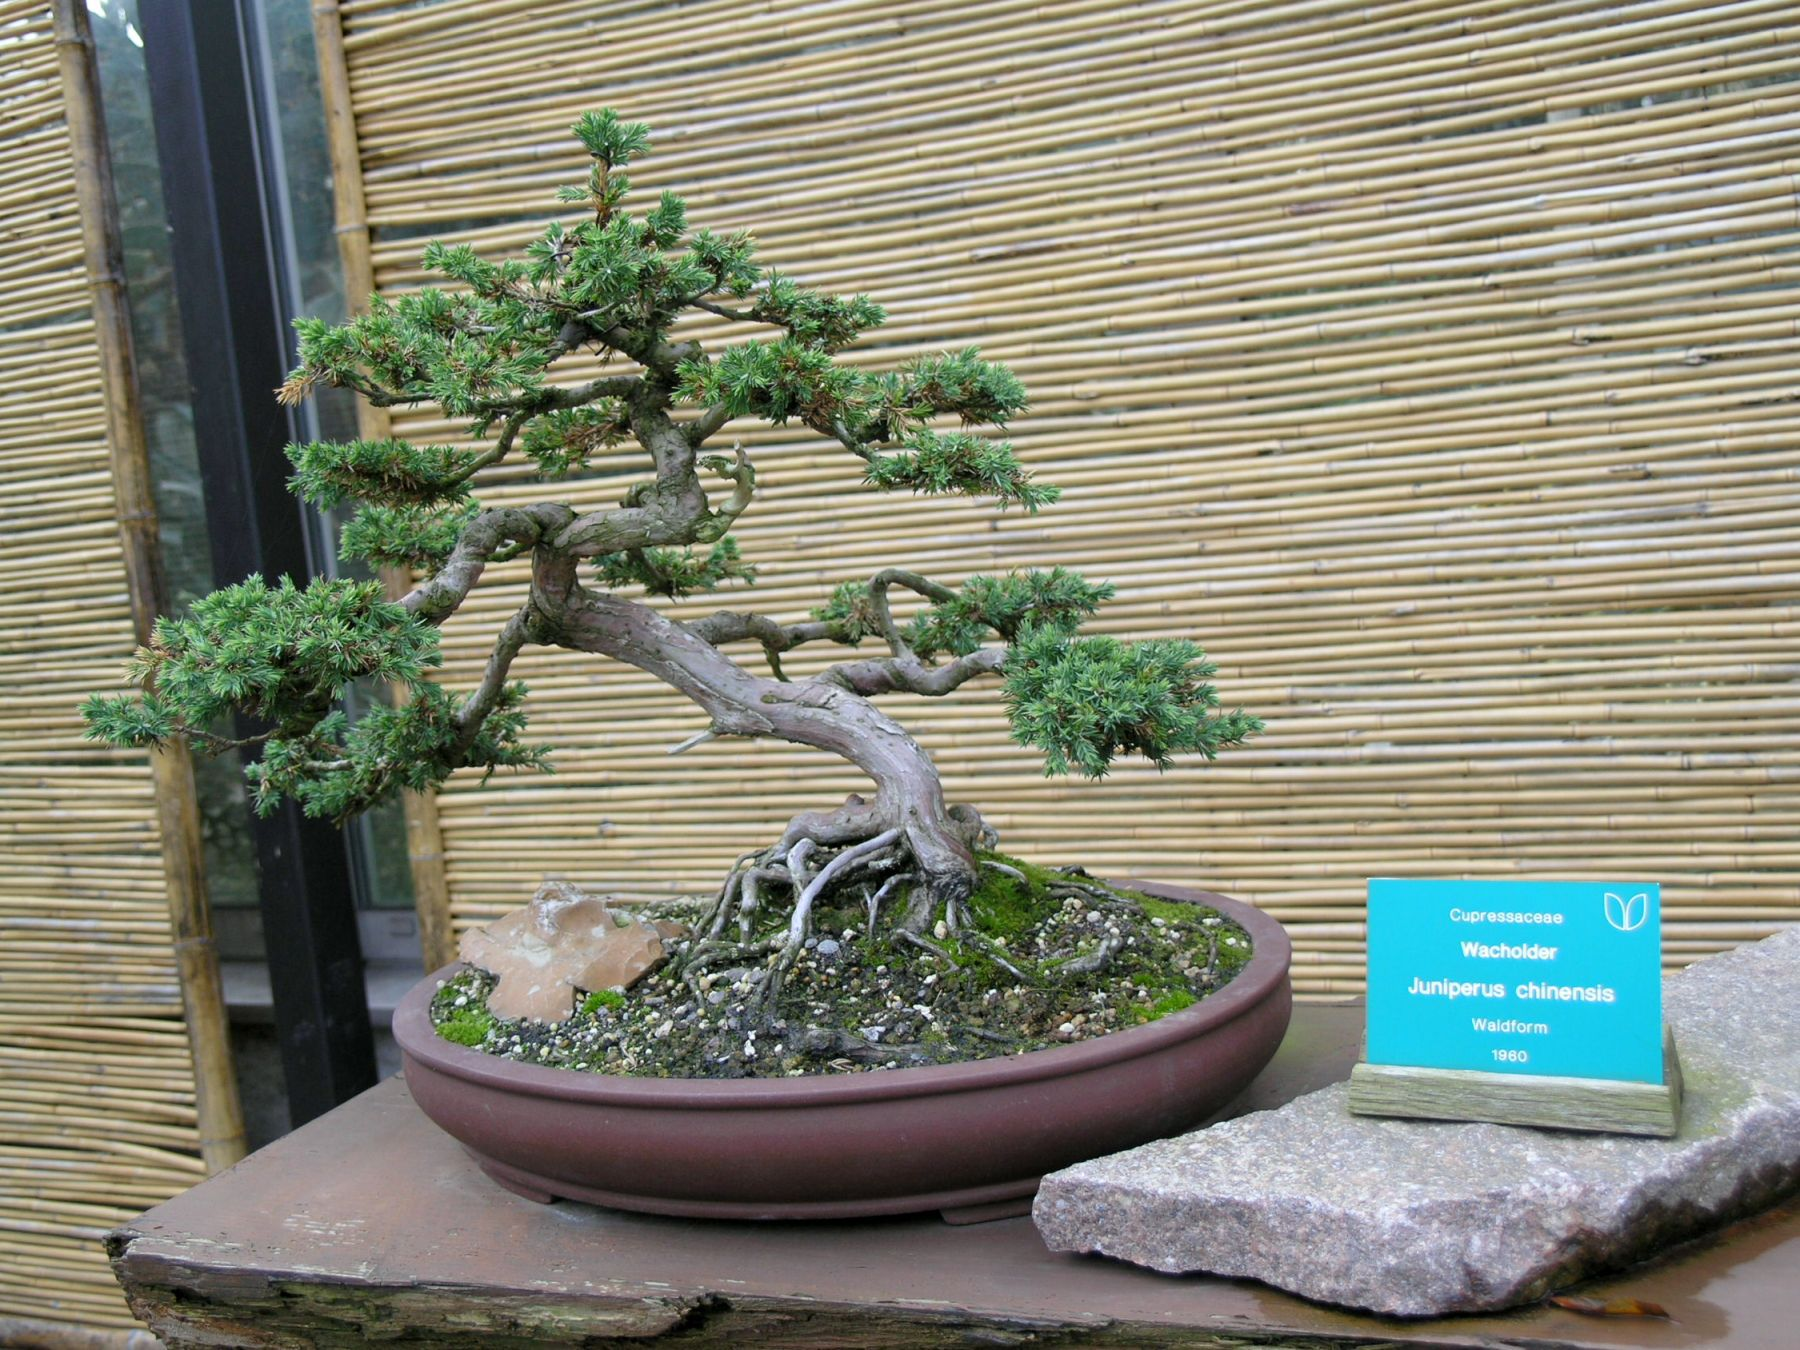 File:Bonsai - juniperus chinensis (1960).jpg